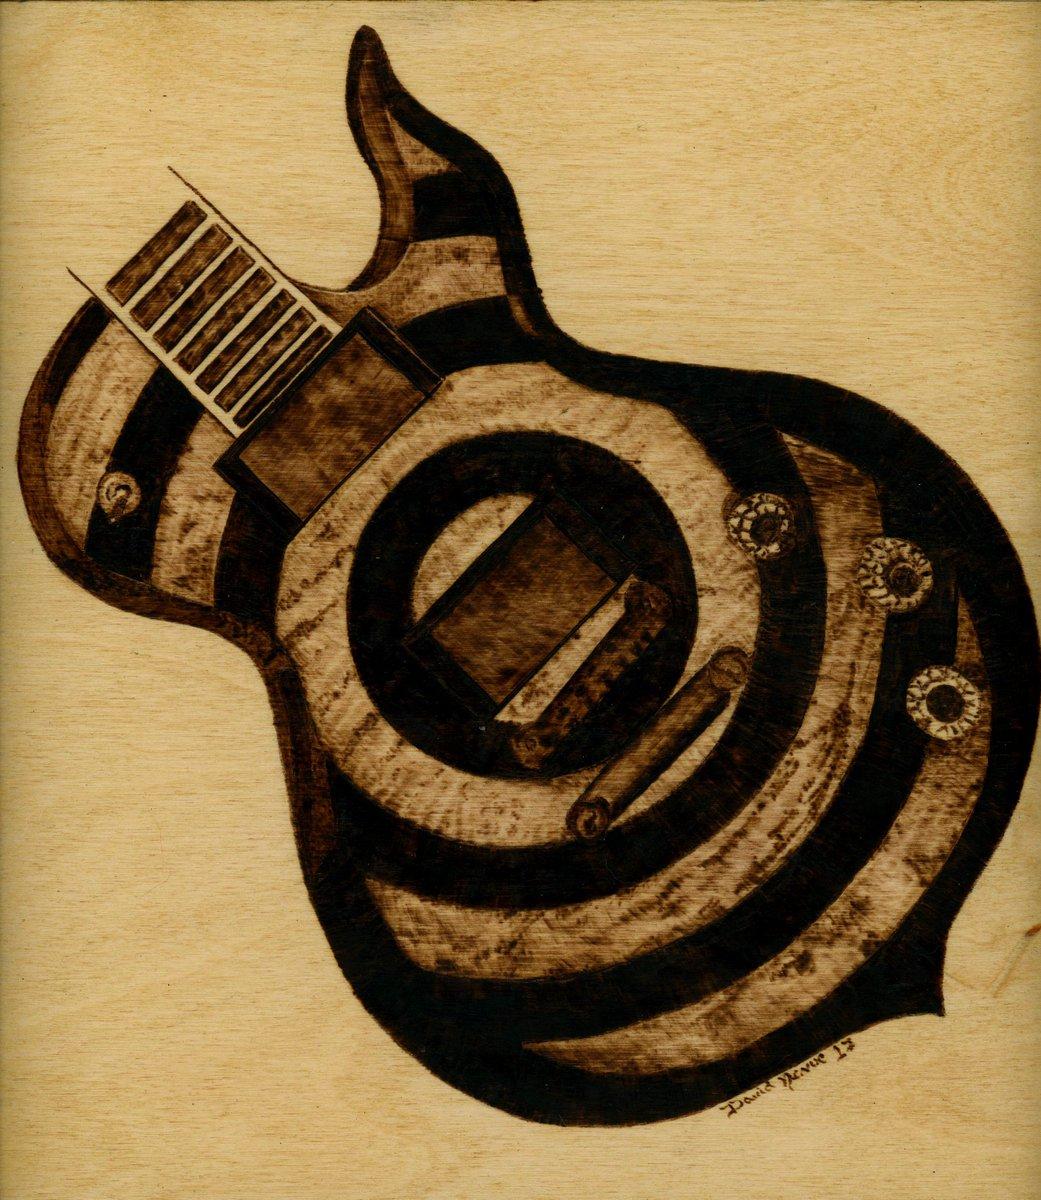 Woodburning Of One My Guitar Students Guitarpictwitter VcVQipoKjs